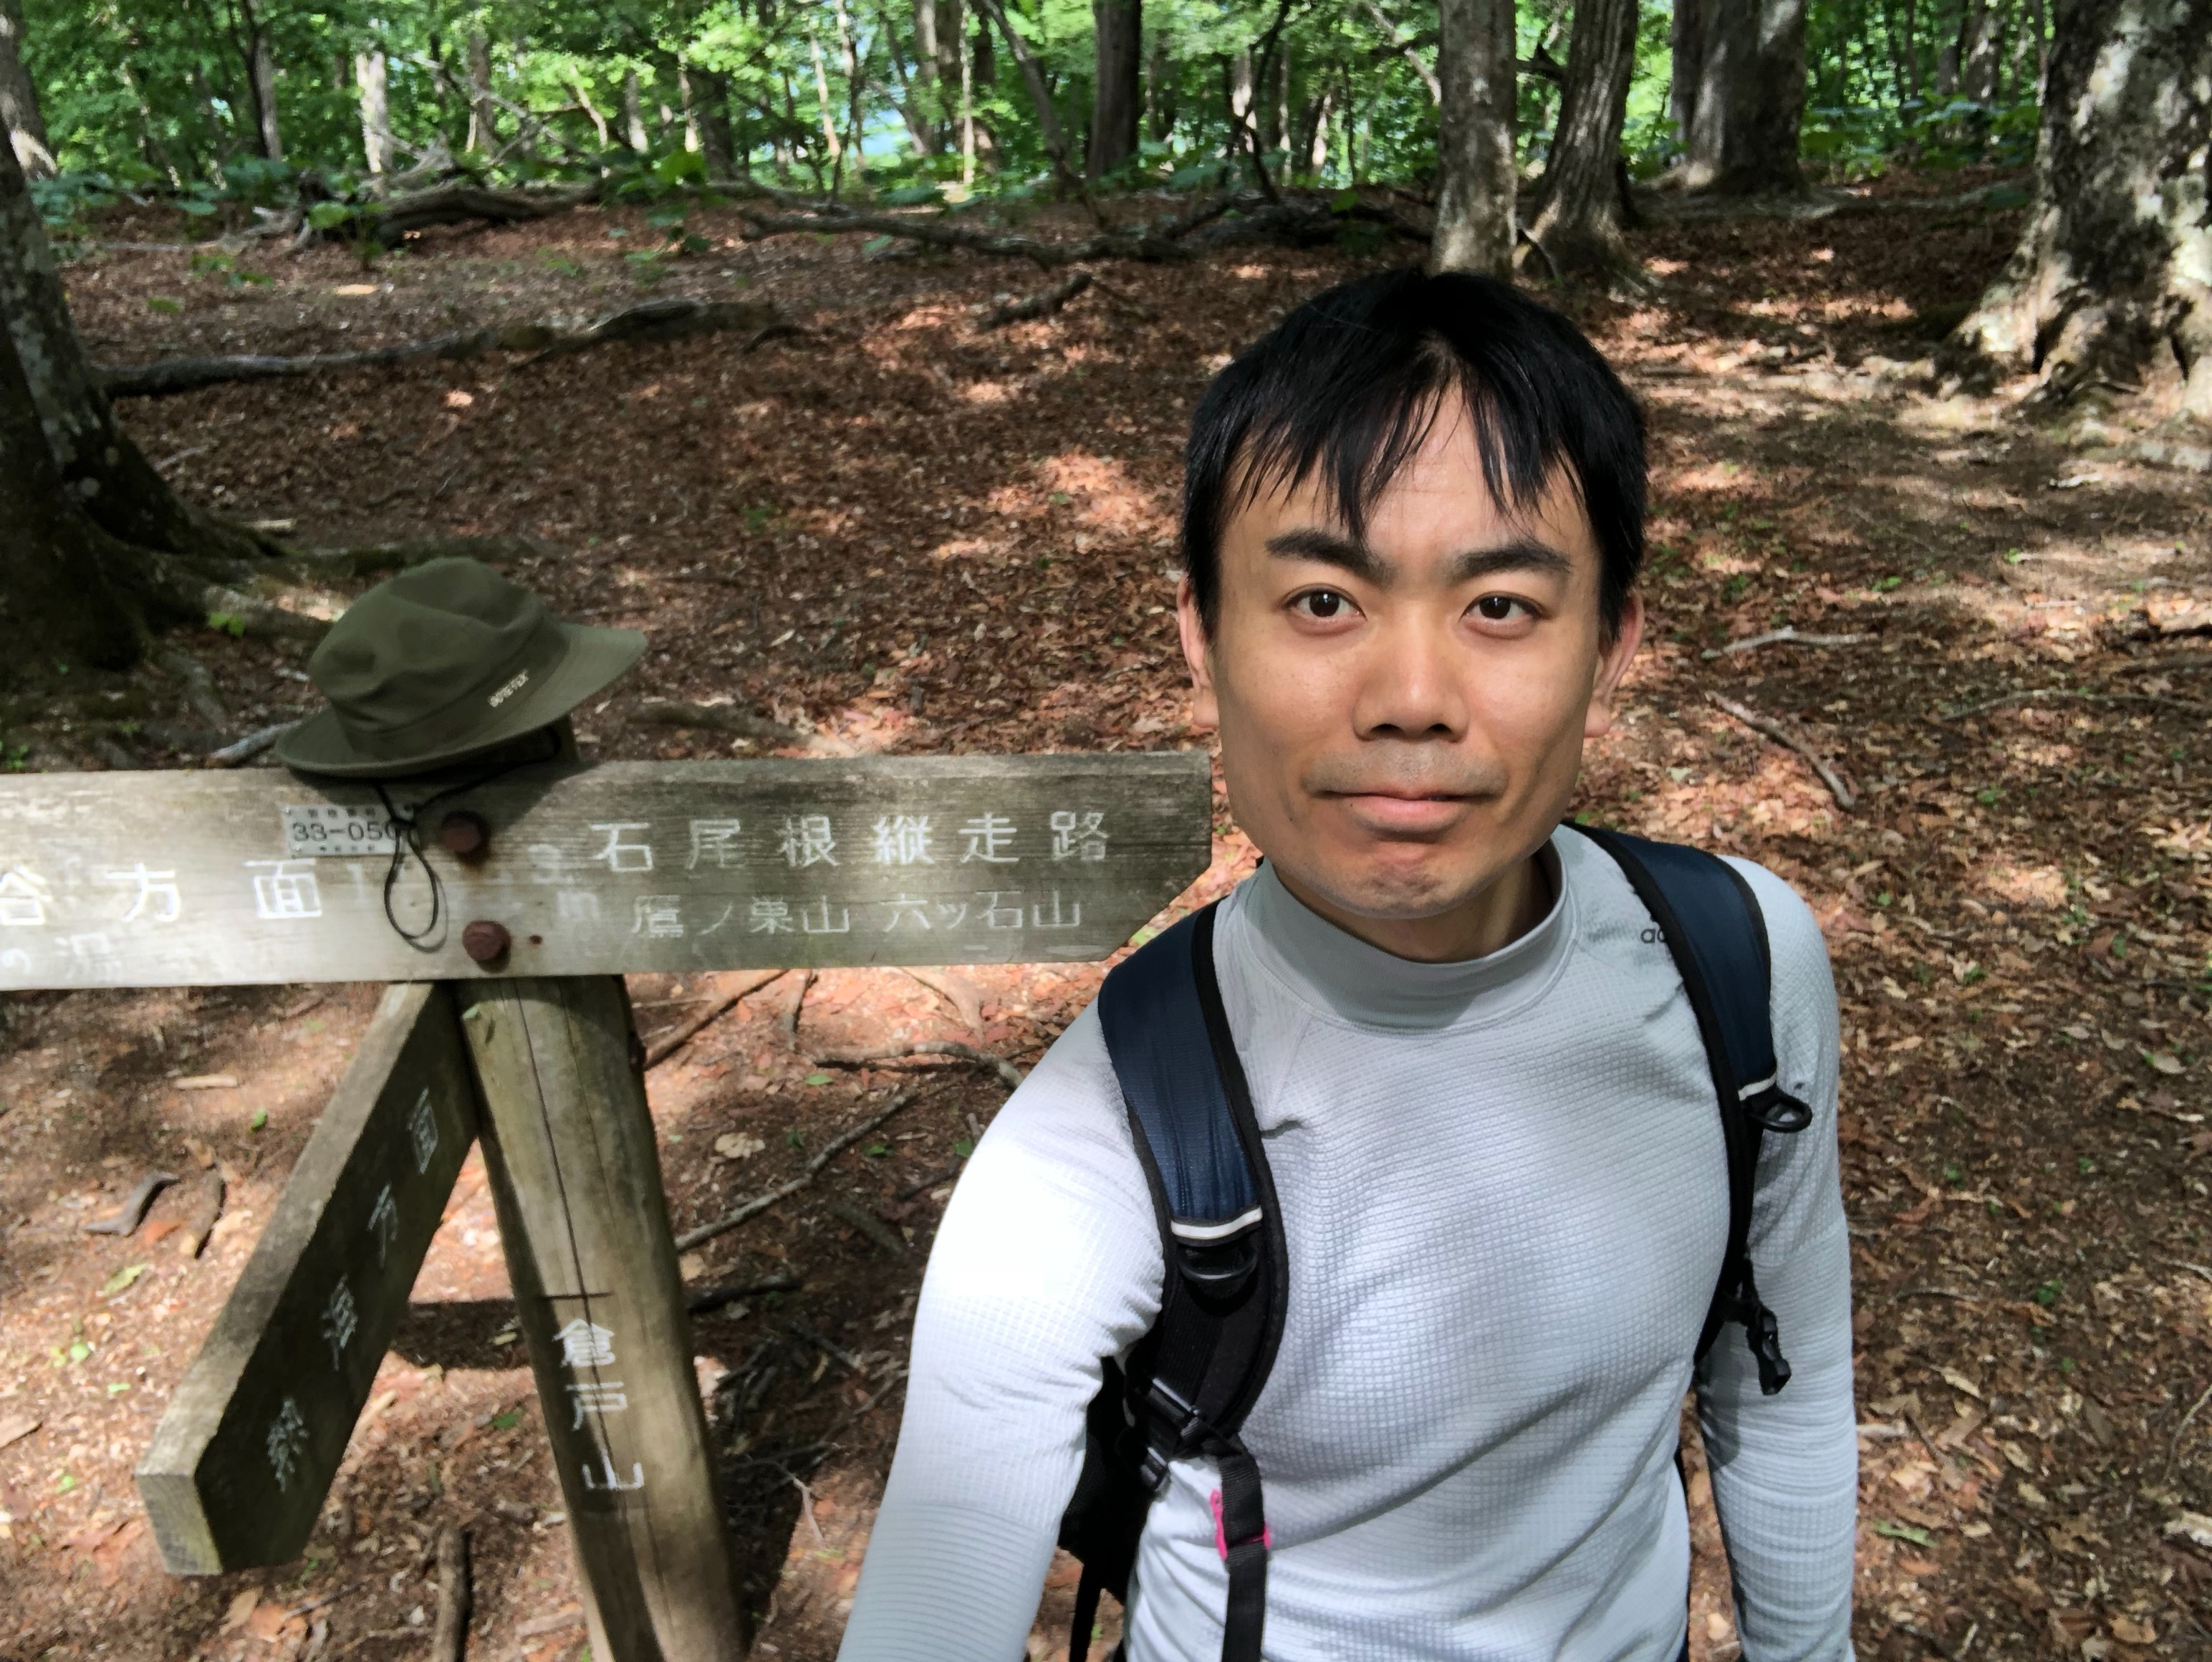 f:id:yanakahachisuke:20180525010512j:image